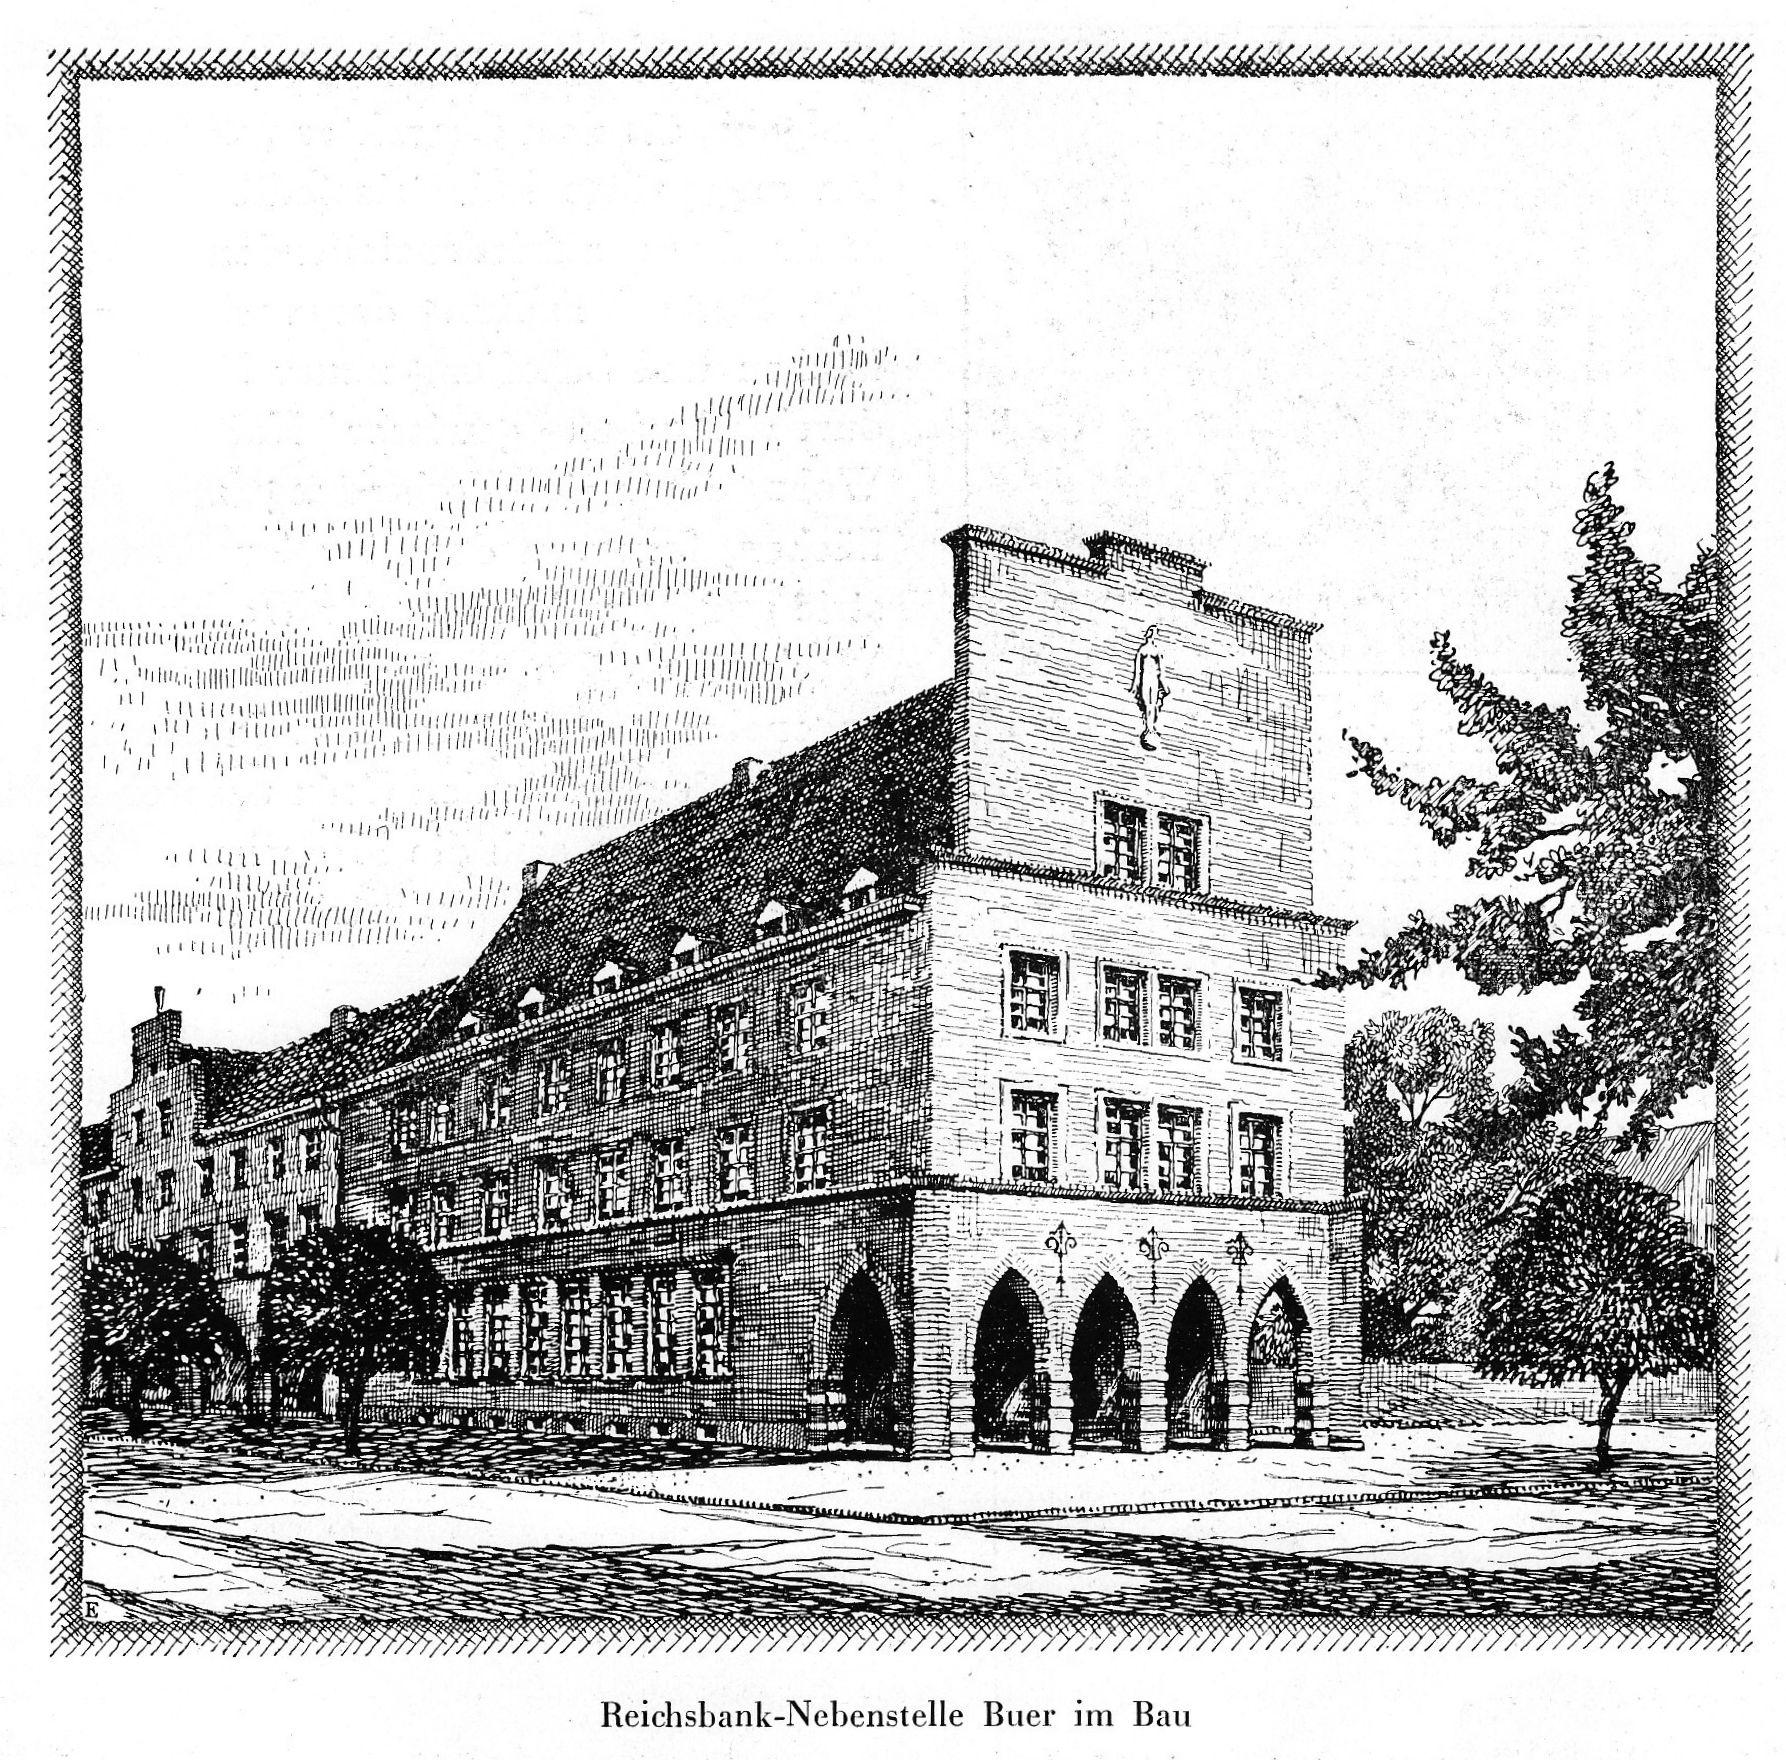 Single wohnungen gelsenkirchen buer Single-Wohnungen in Gelsenkirchen Buer